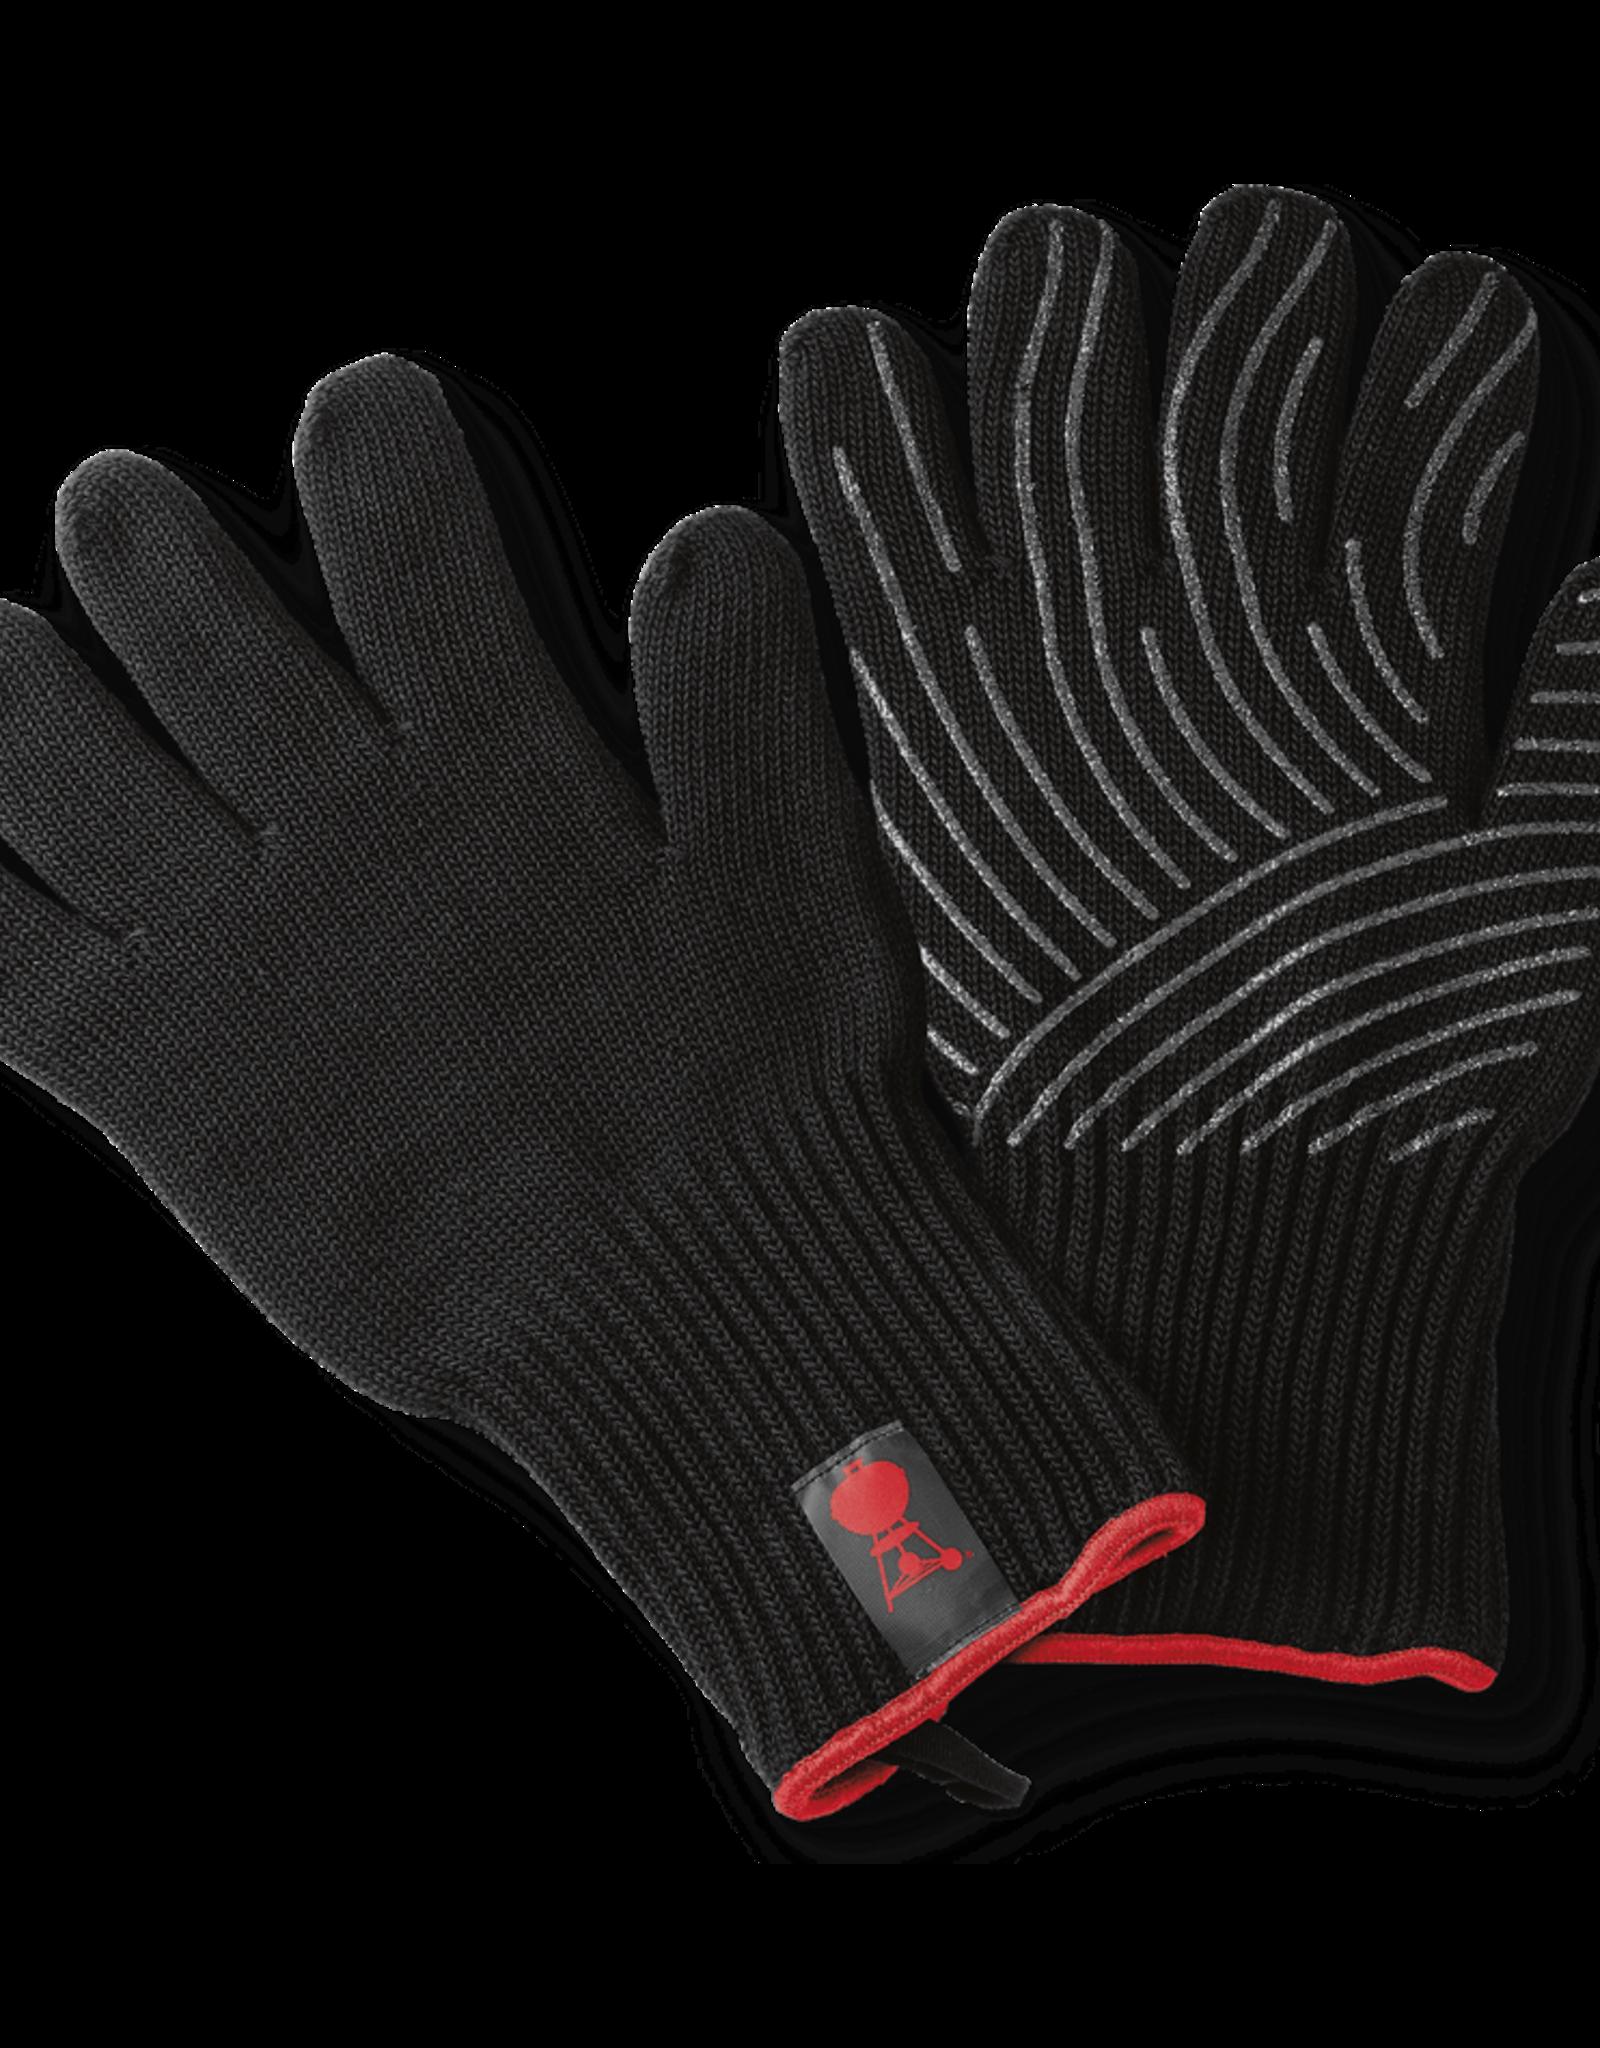 Weber Premium Gloves - Size L/XL